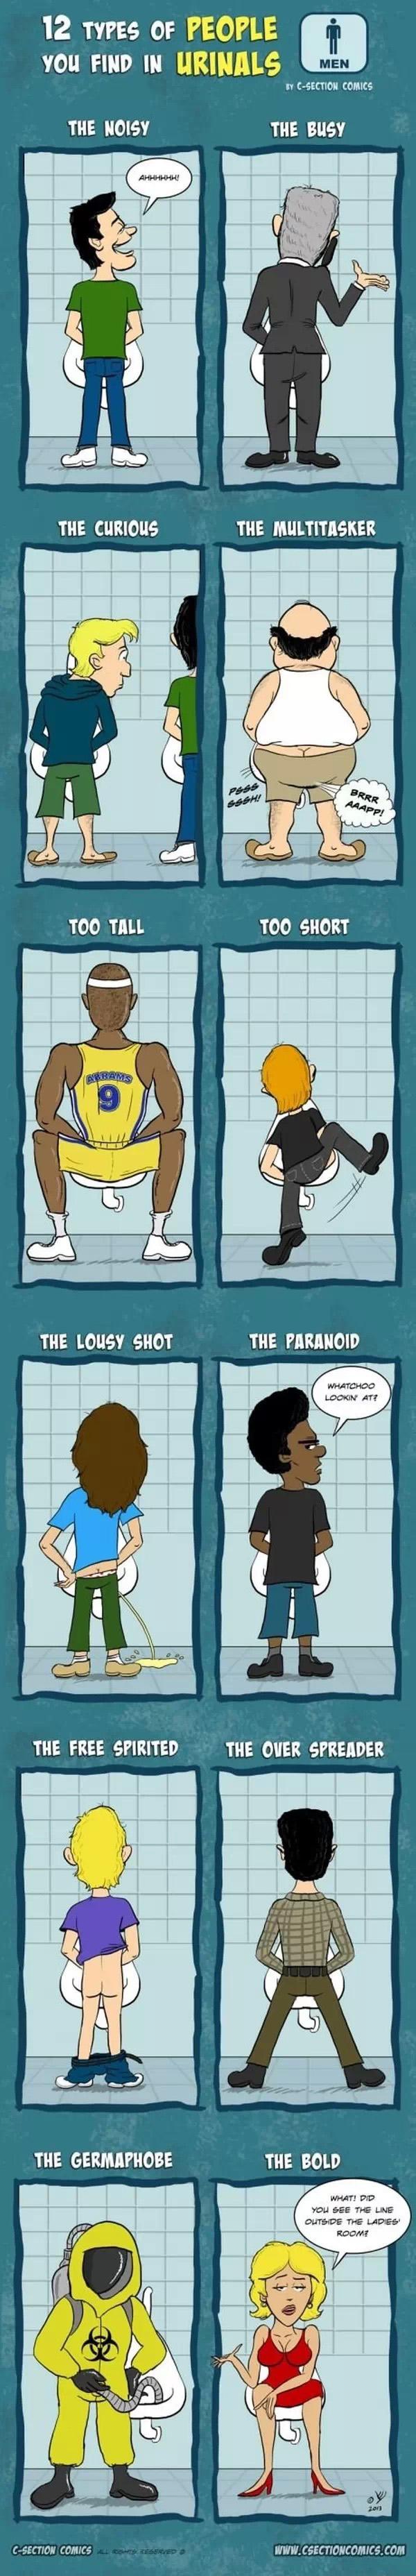 Urinal Humor!